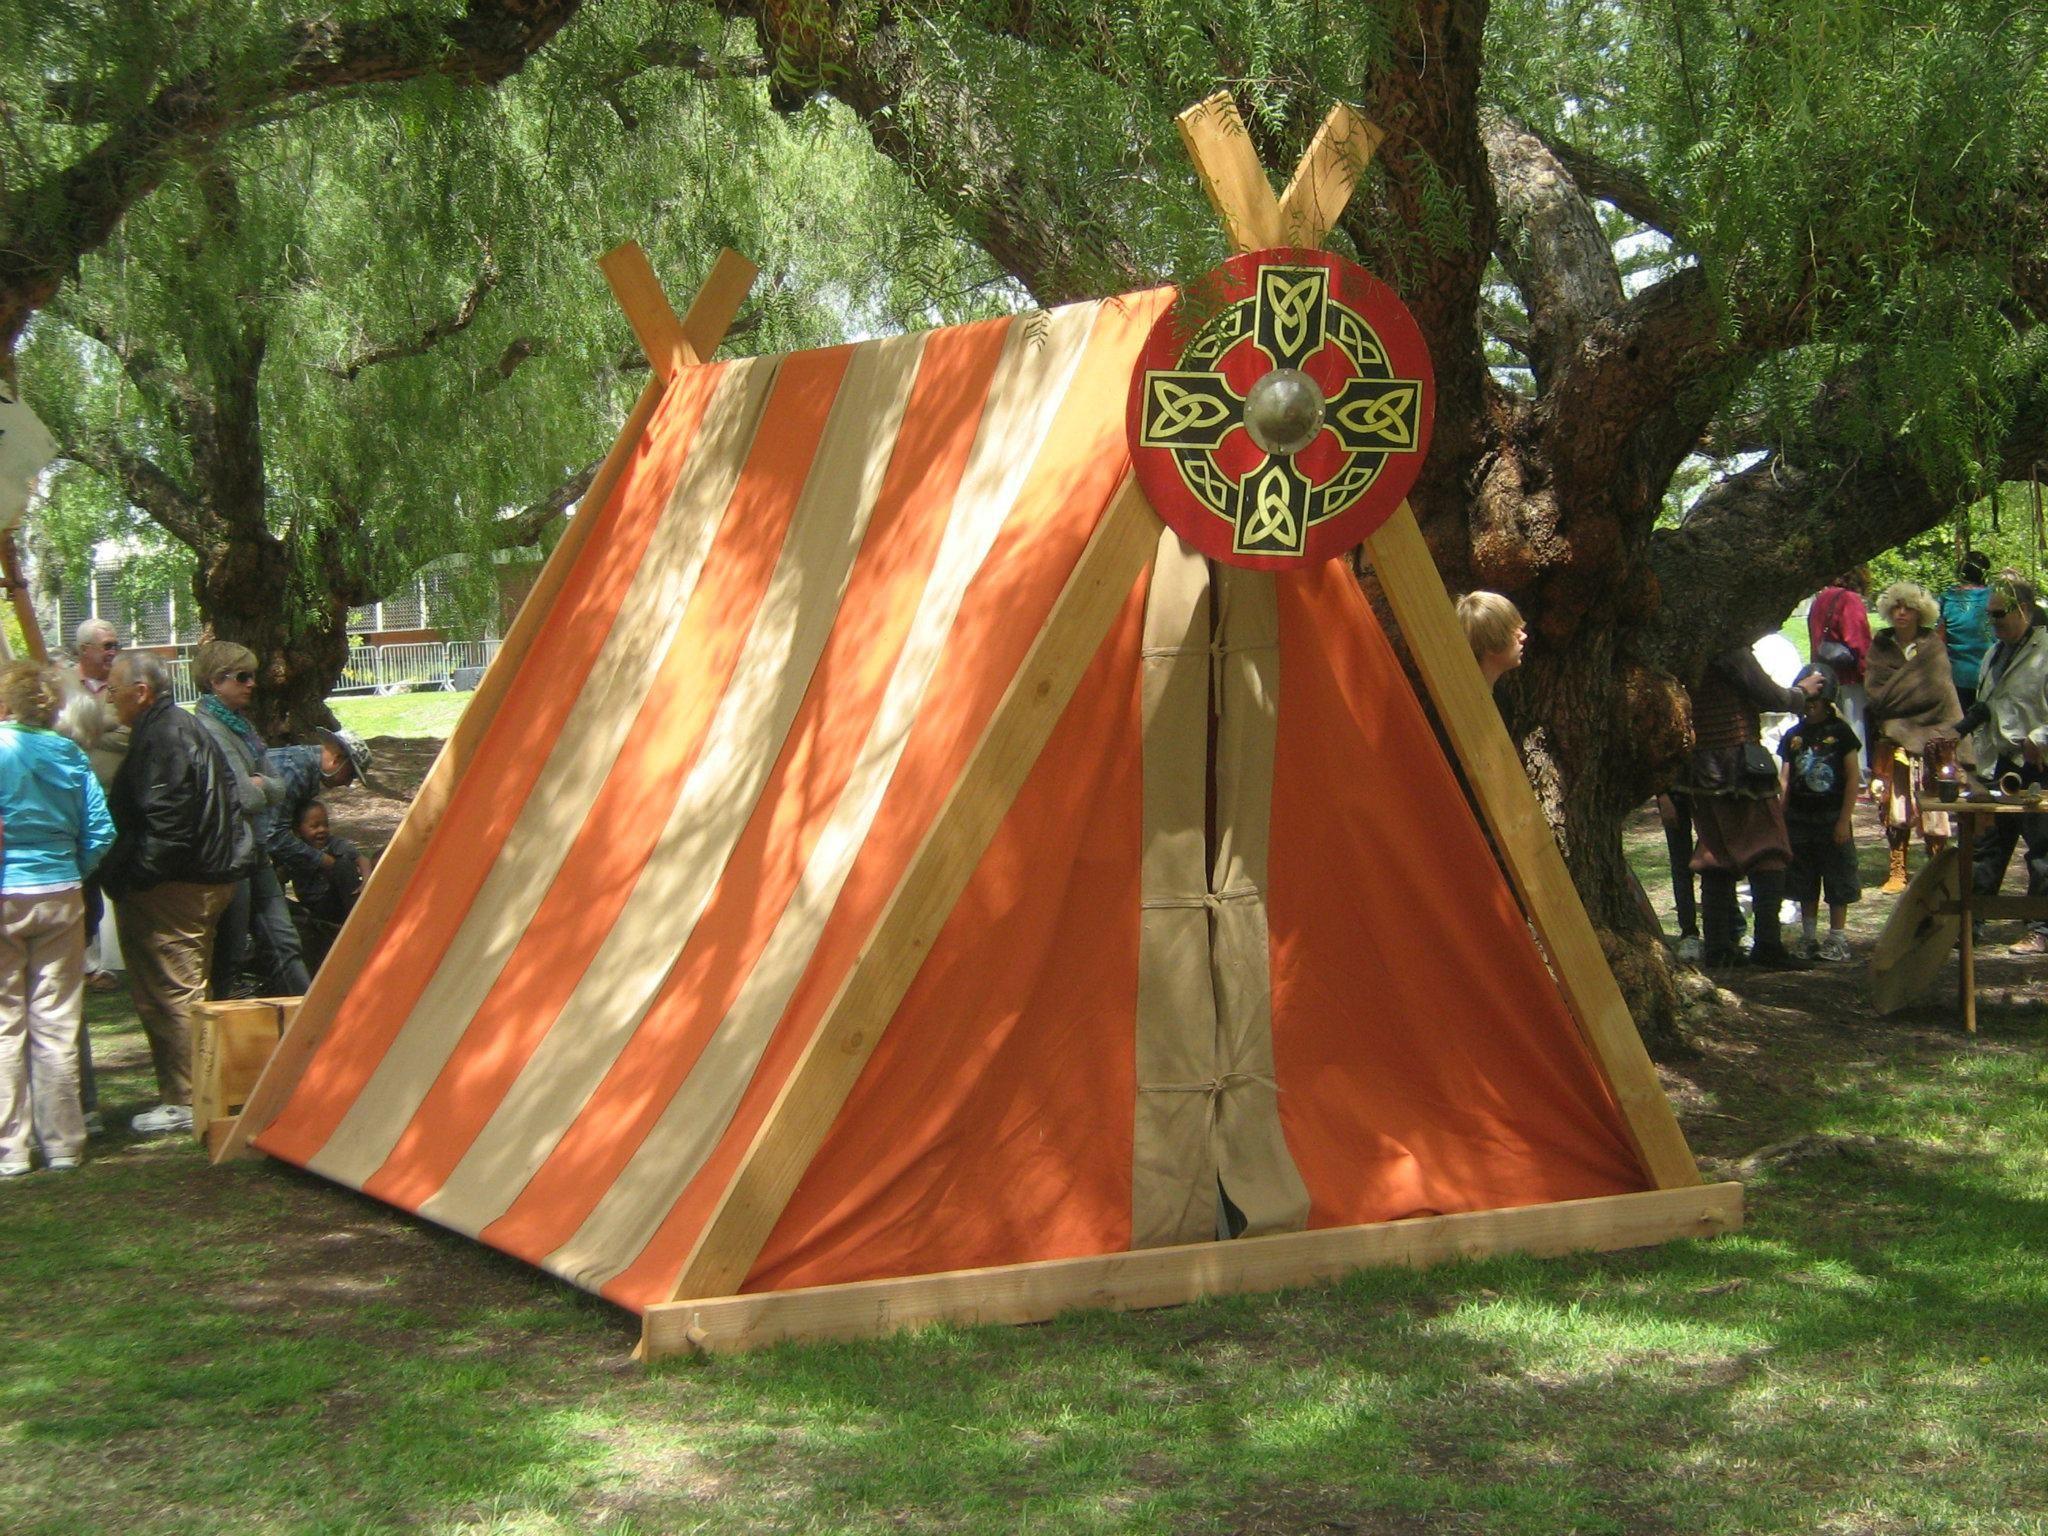 viking tent plans - Google Search & viking tent plans - Google Search | Aakre art | Pinterest ...